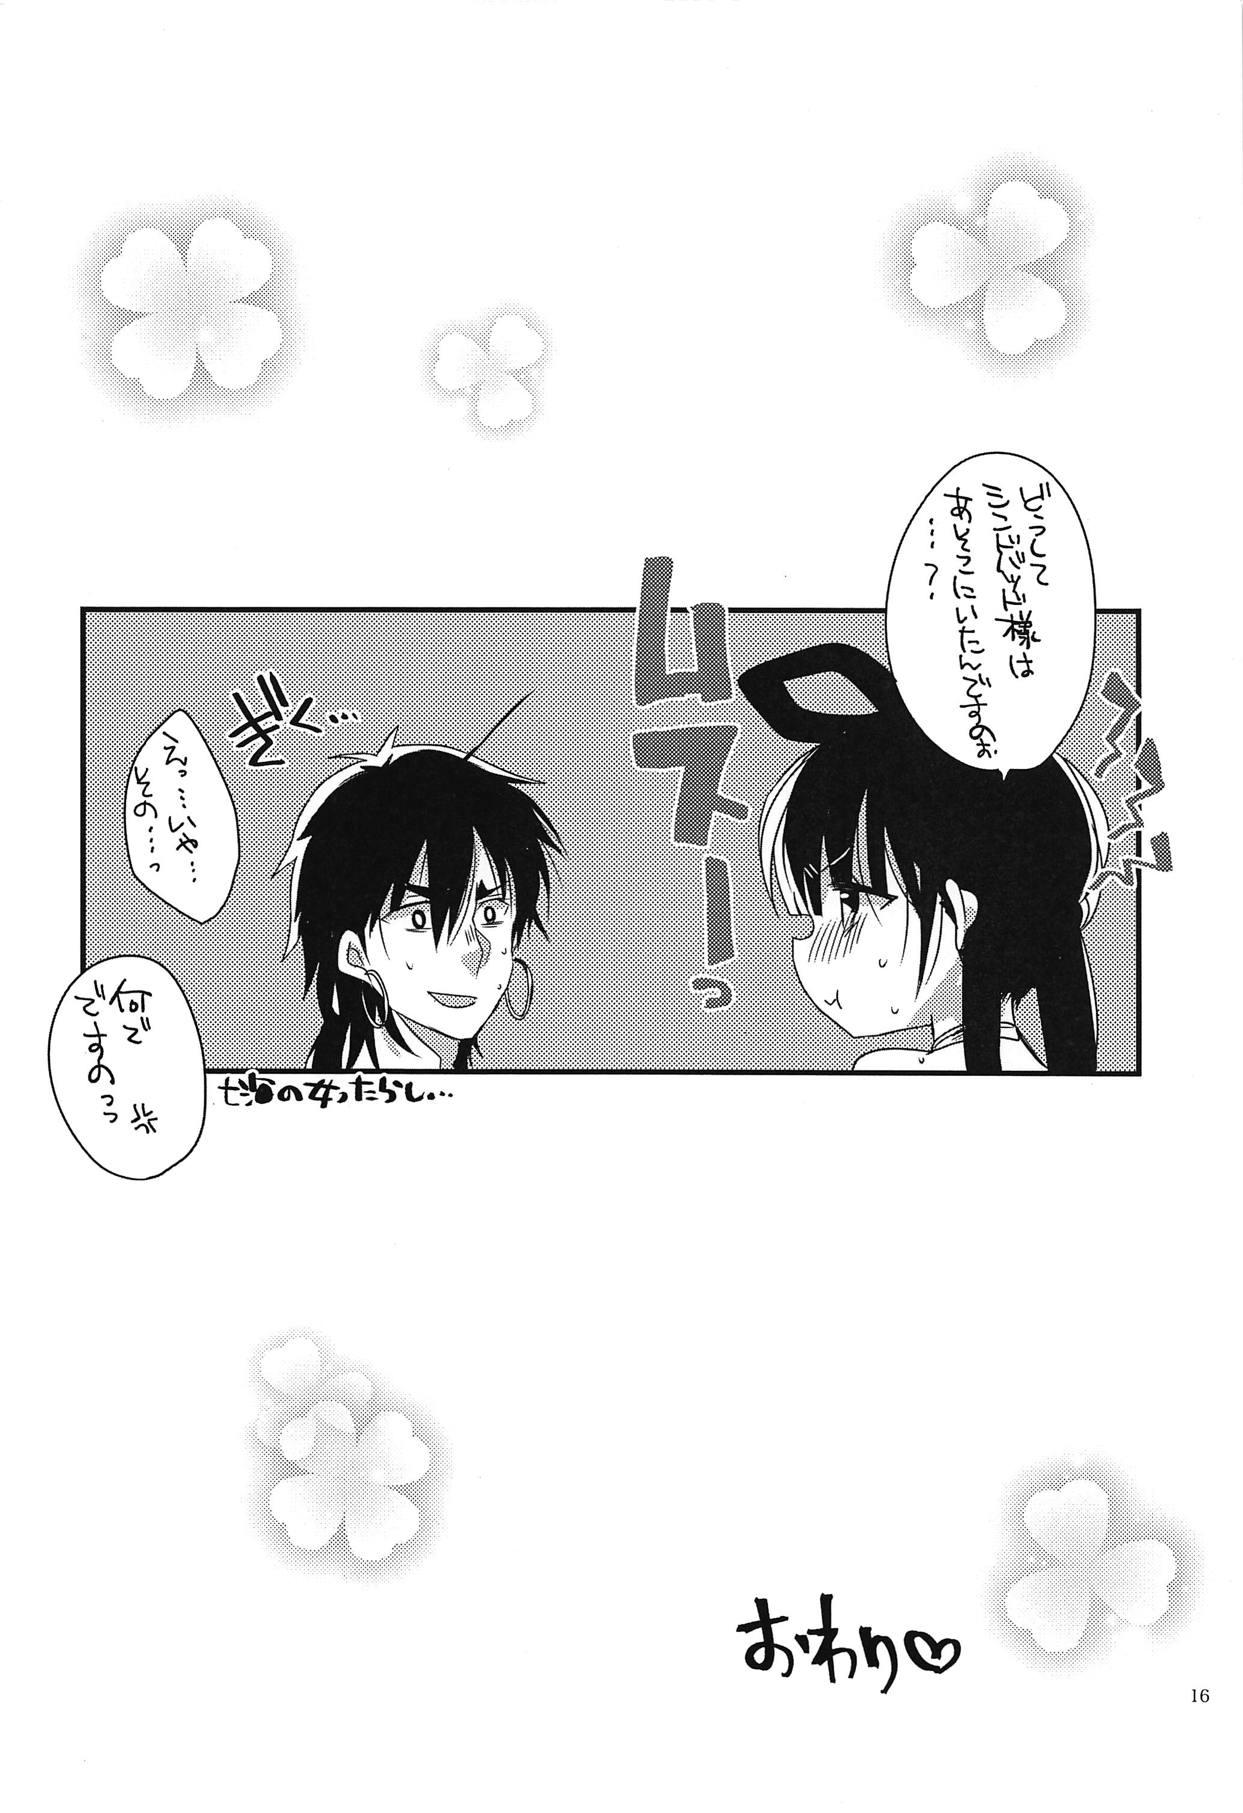 Himegimi wa Koyoi mo Ou-sama to 14